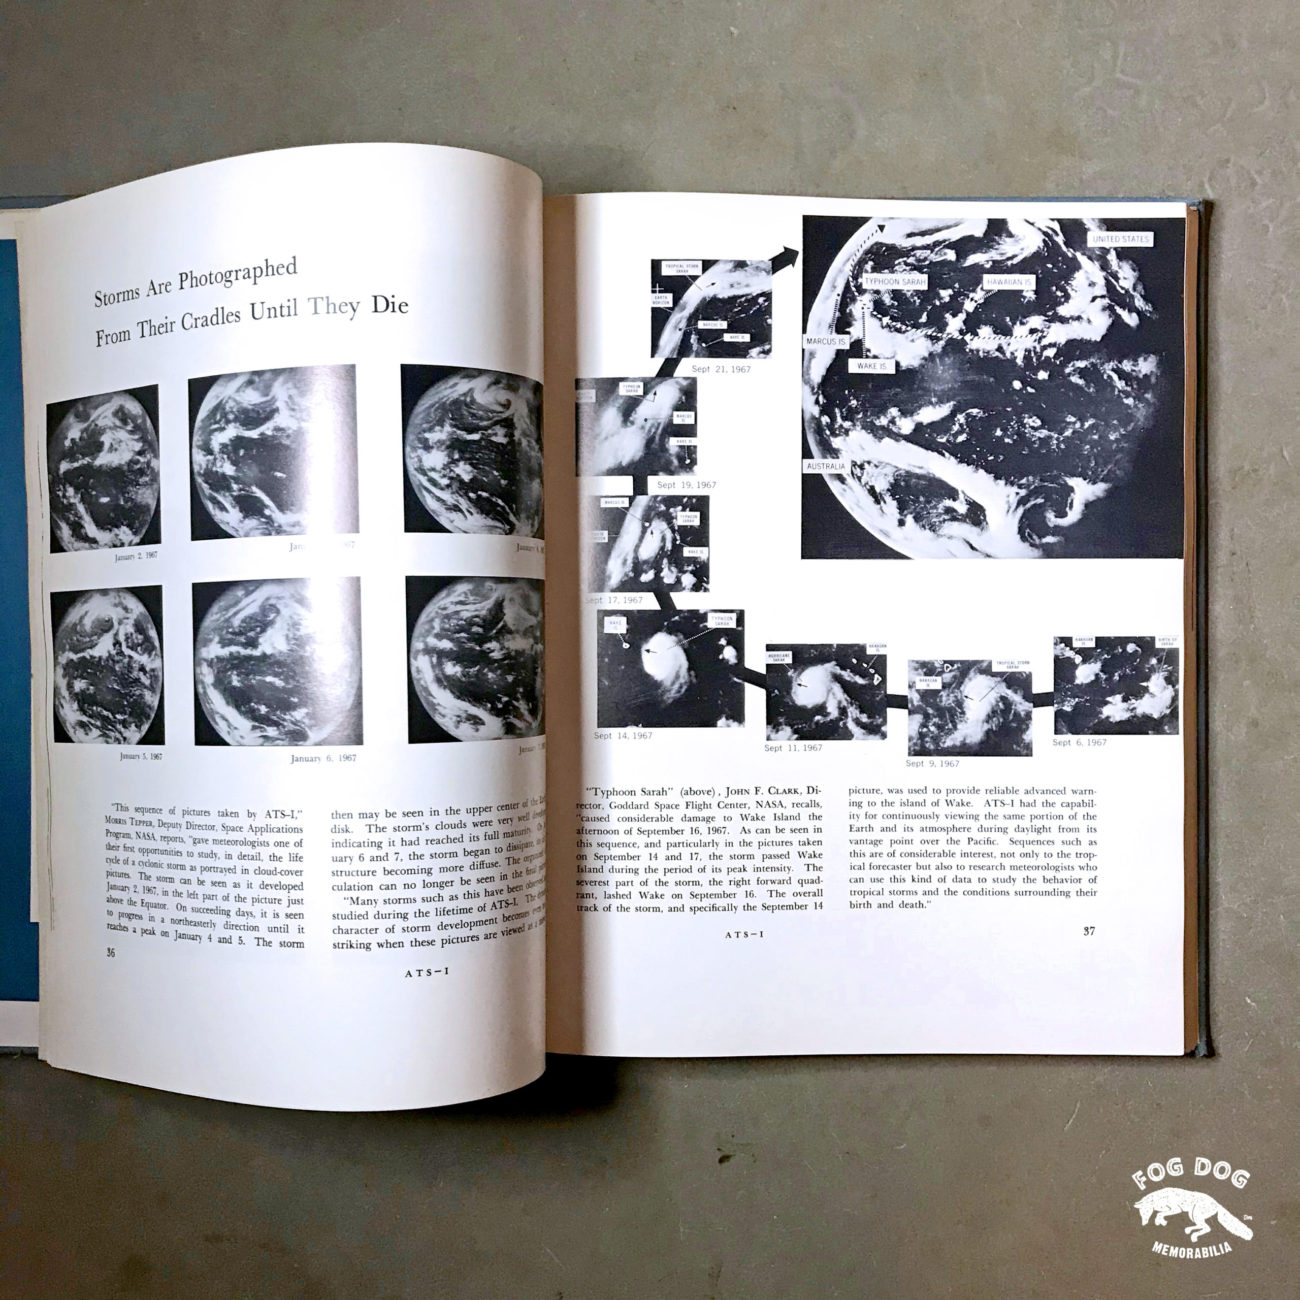 NASA publikace EXPLORING SPACE WITH A CAMERA (1968)